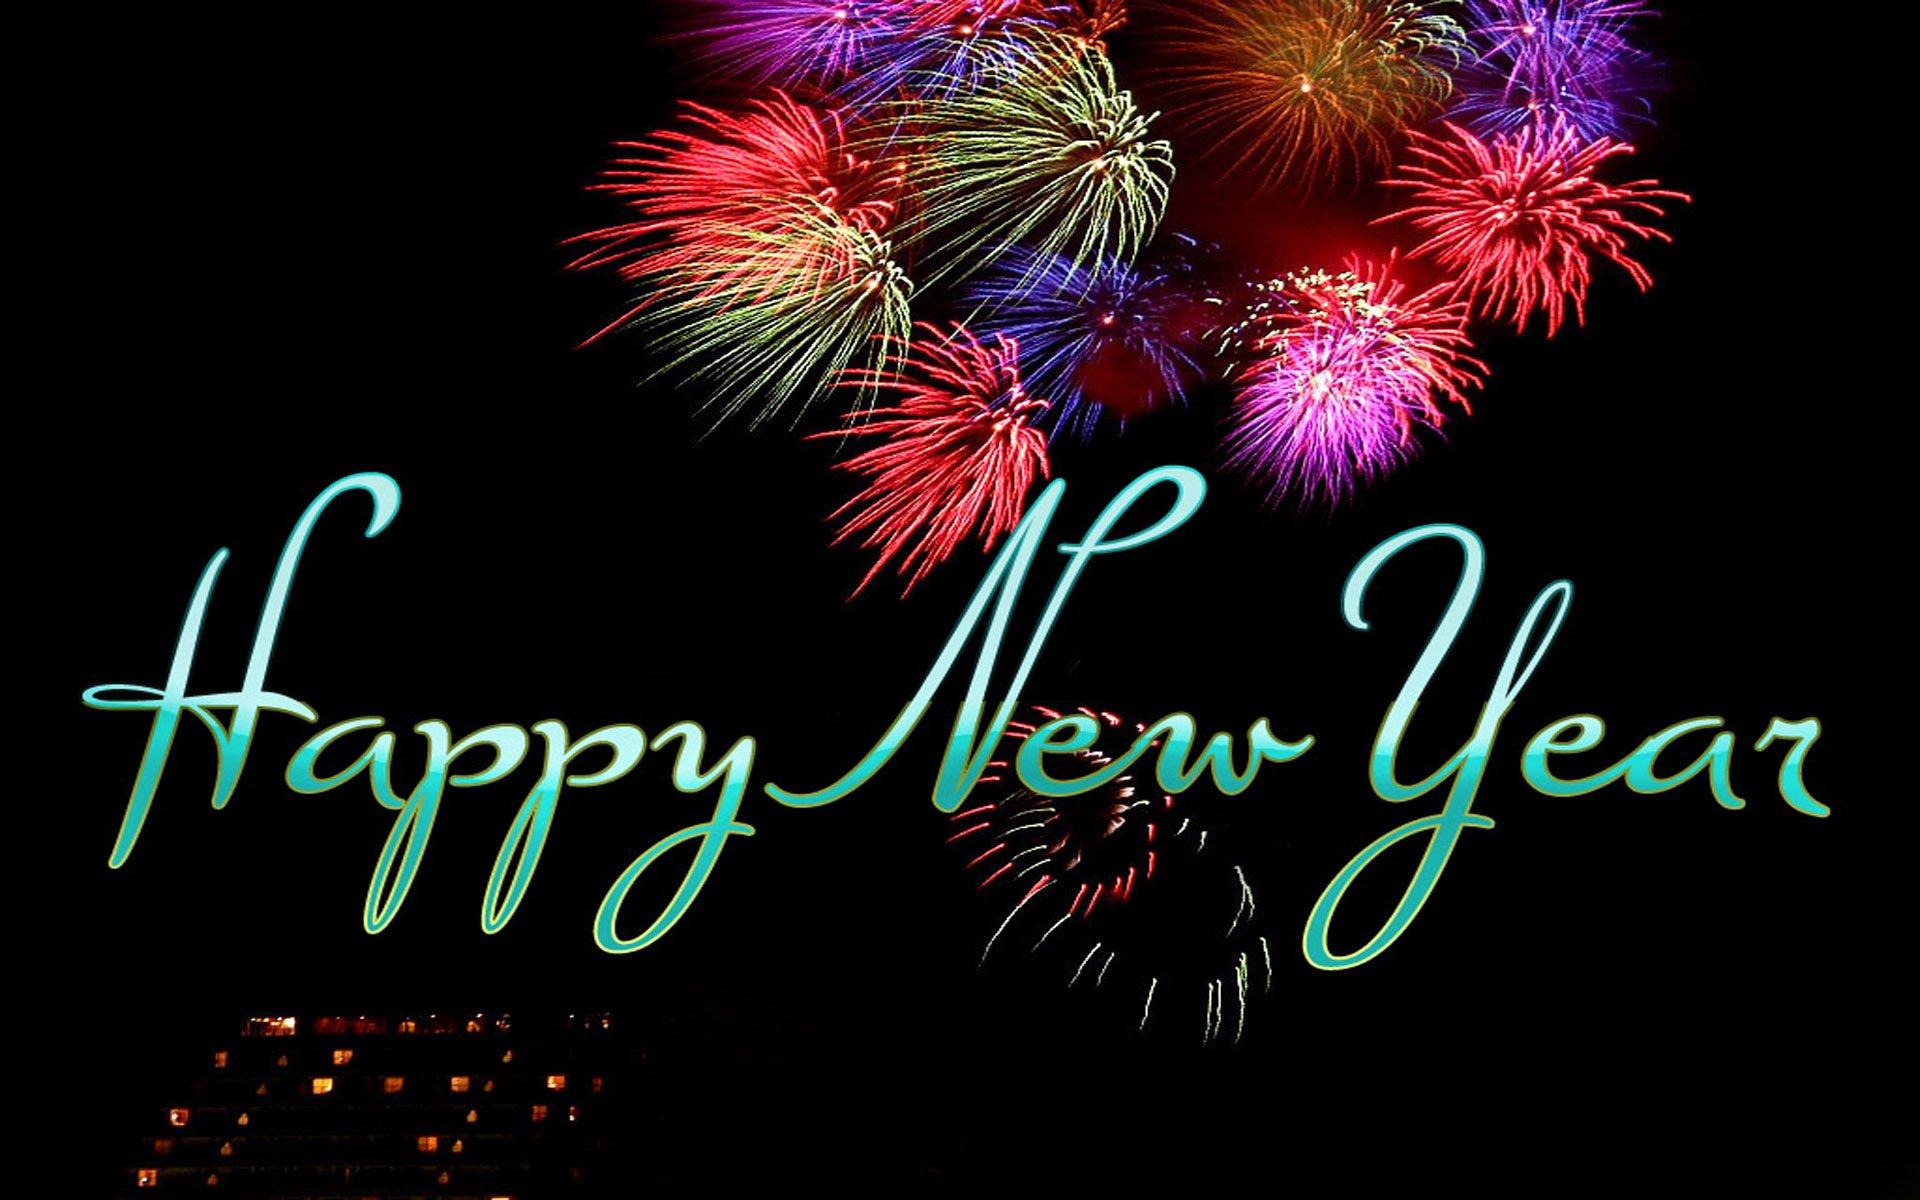 Happy New Year Pics For Whatsapp